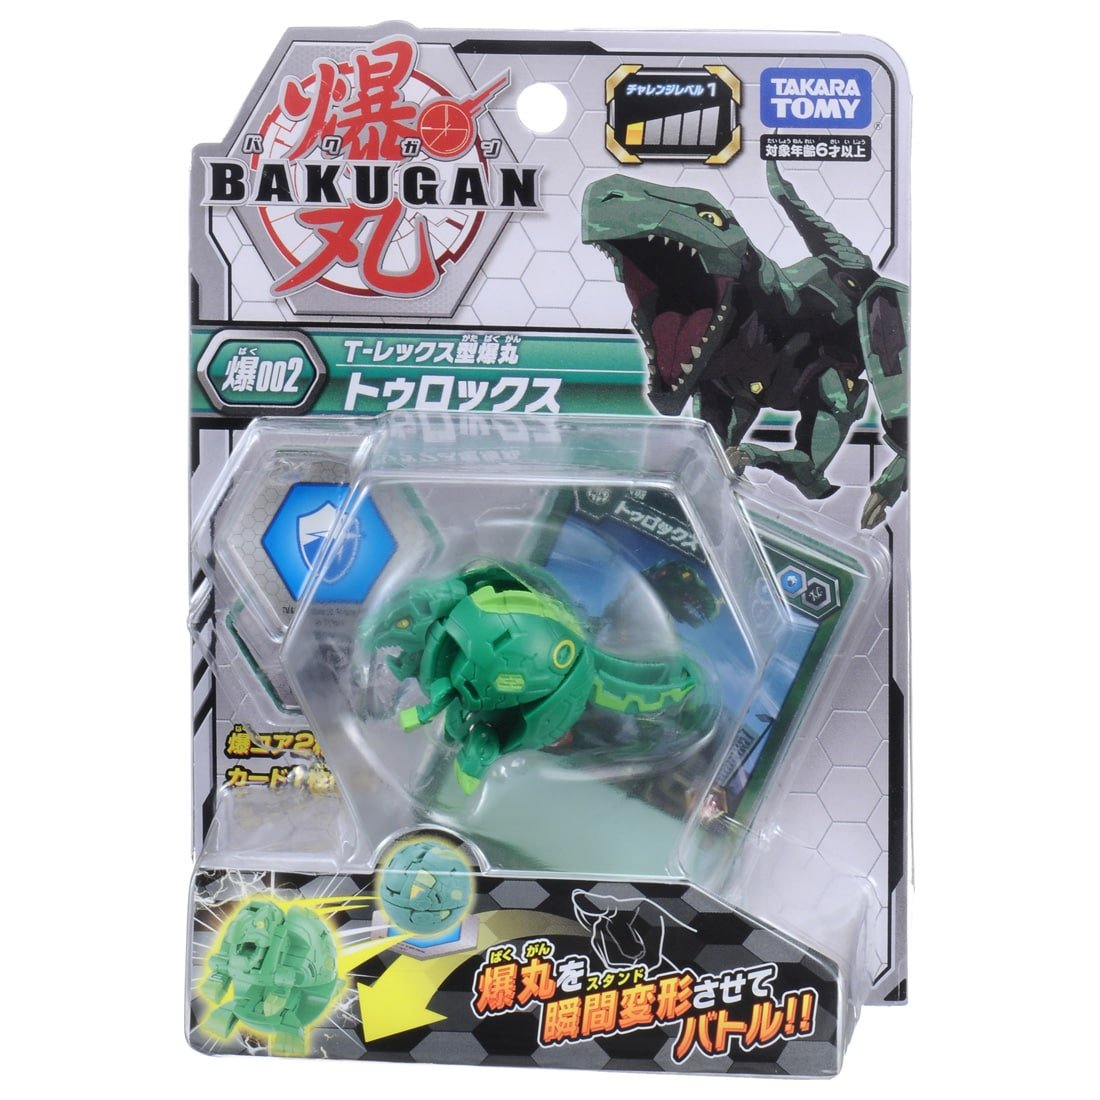 TAKARA TOMY 爆丸 爆002 基本爆丸 Trox GREEN